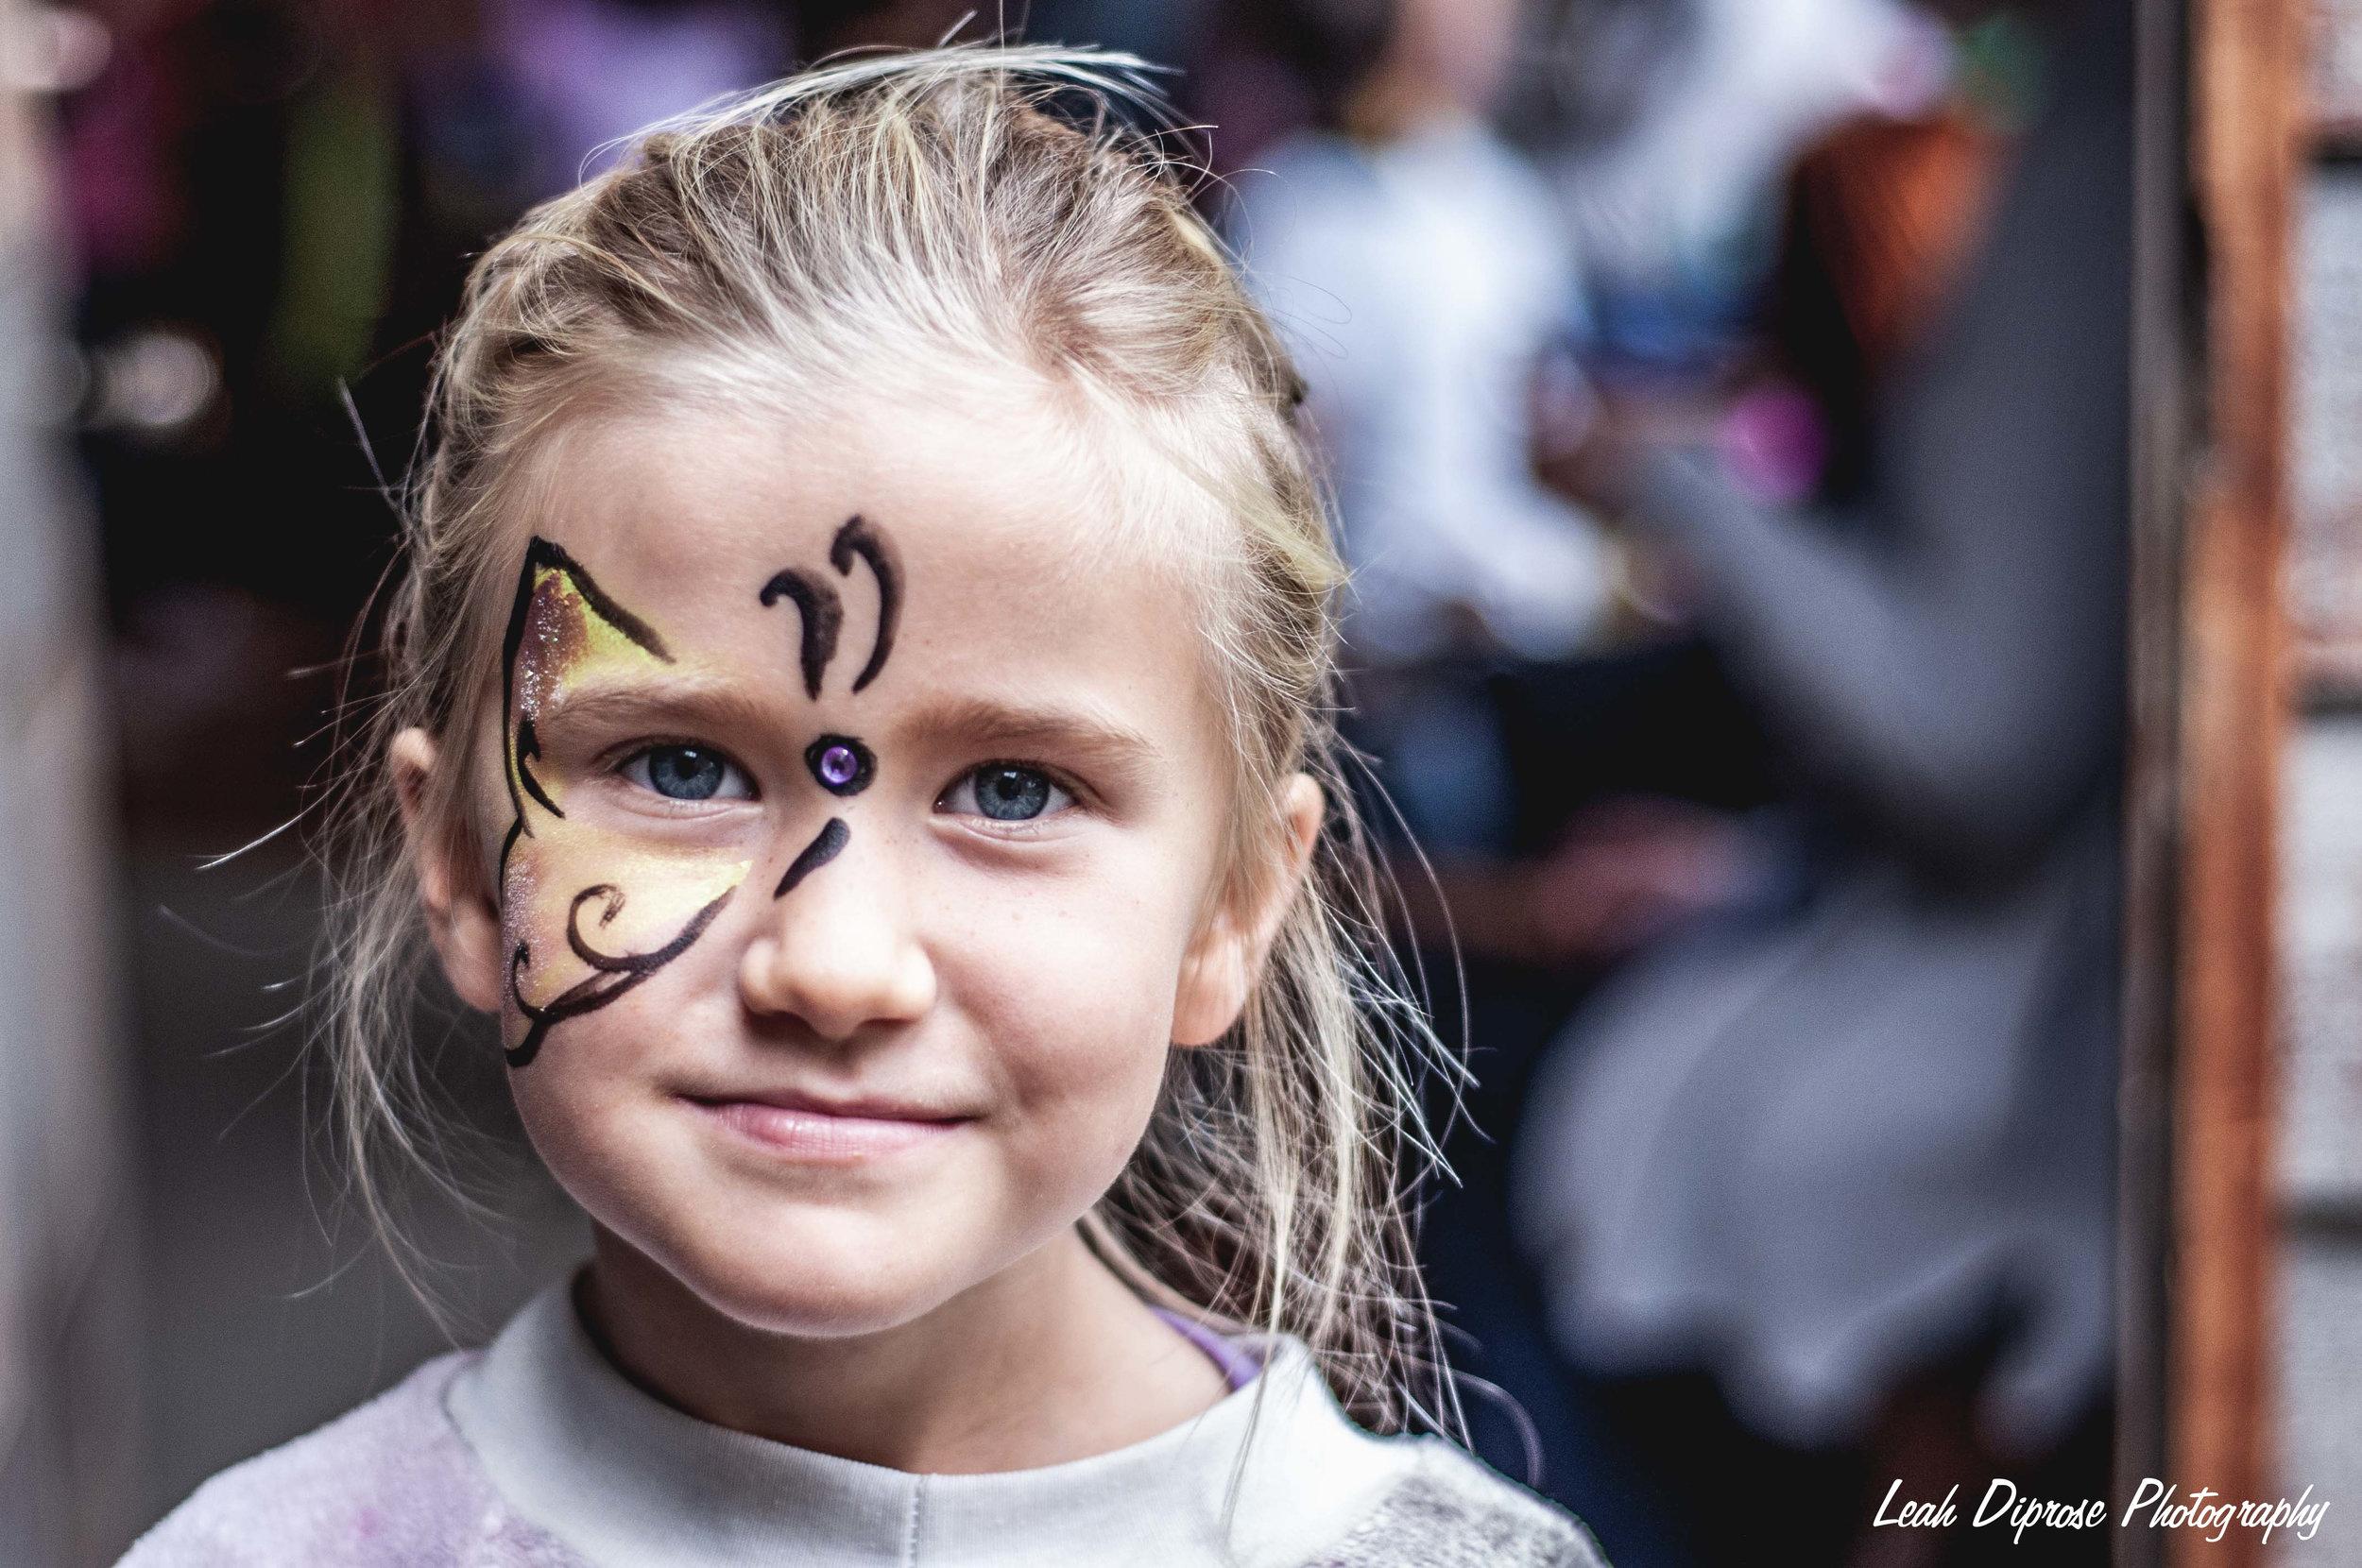 Leah Diprose Photography image-6779.jpg